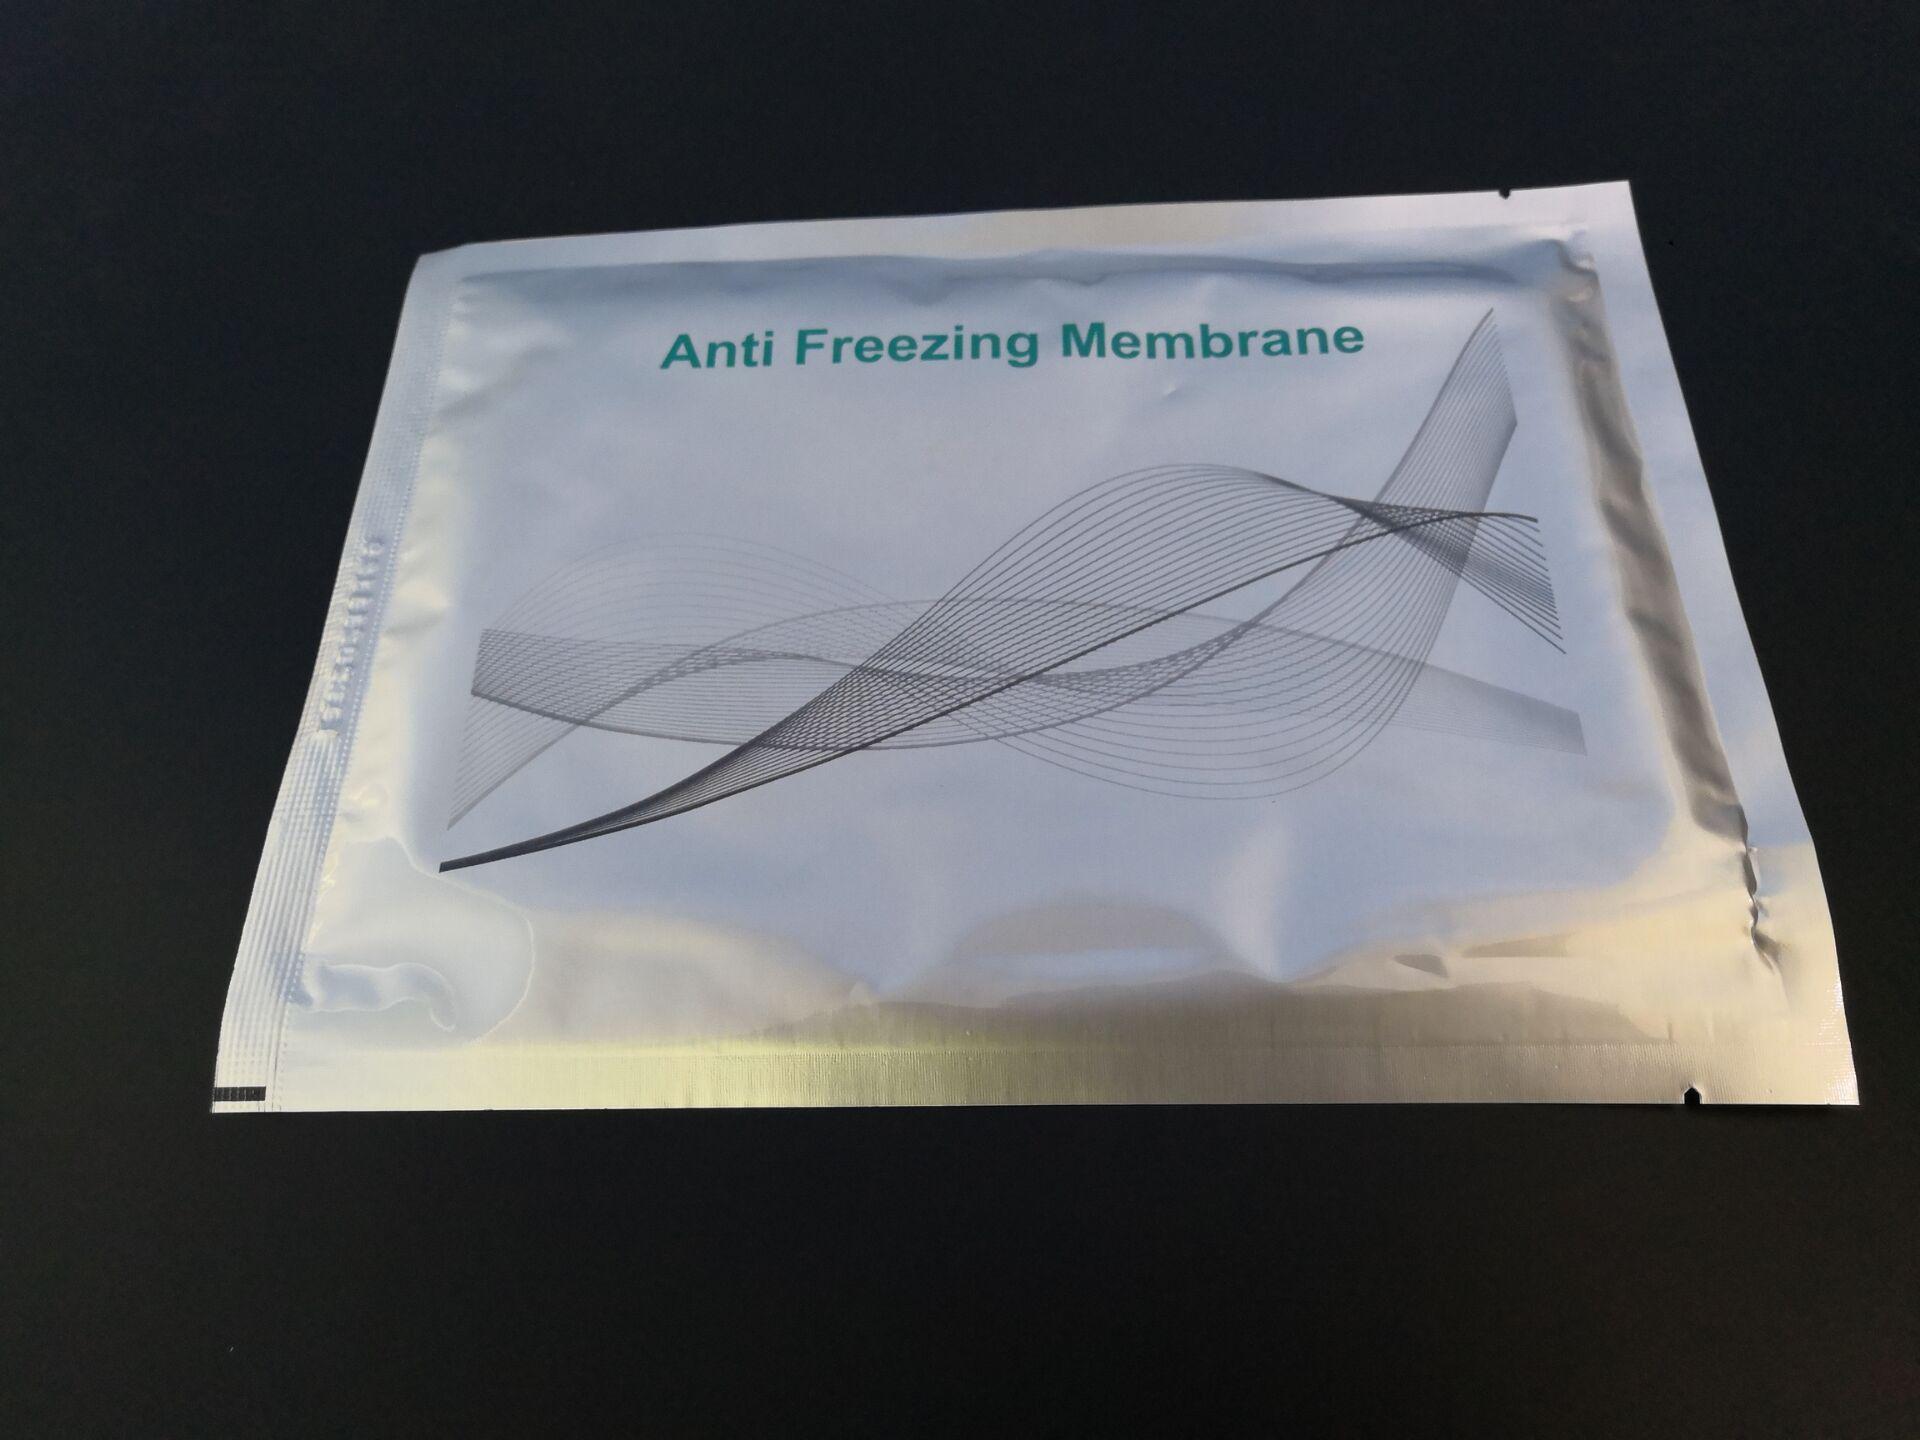 High Quality Antifreeze Membrane Anti Freezing Membrane Anti Freeze Film For Fat Freeze Treatment Anti Freezing Cryo Pad 27*30cm